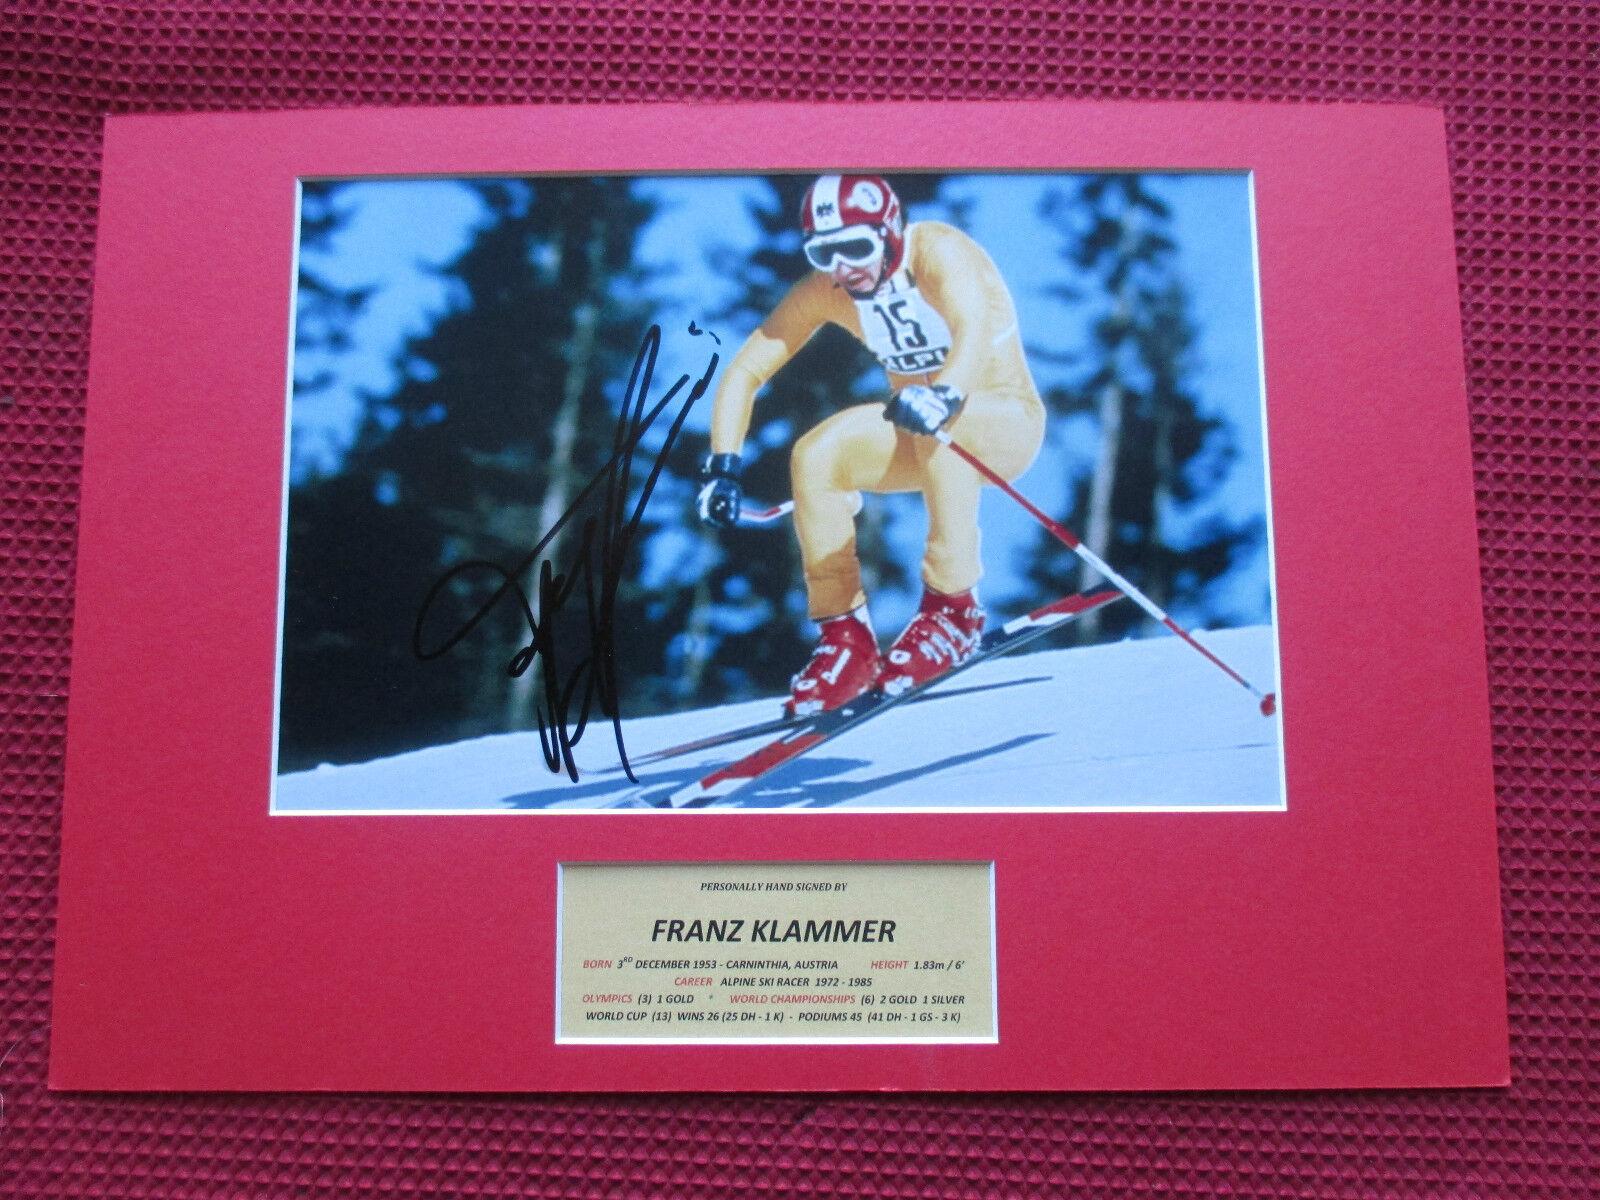 FRANZ KLAMMER CHAMPION SKIER GENUINE HAND SIGNED A3 MOUNTED PHOTO DISPLAY - COA